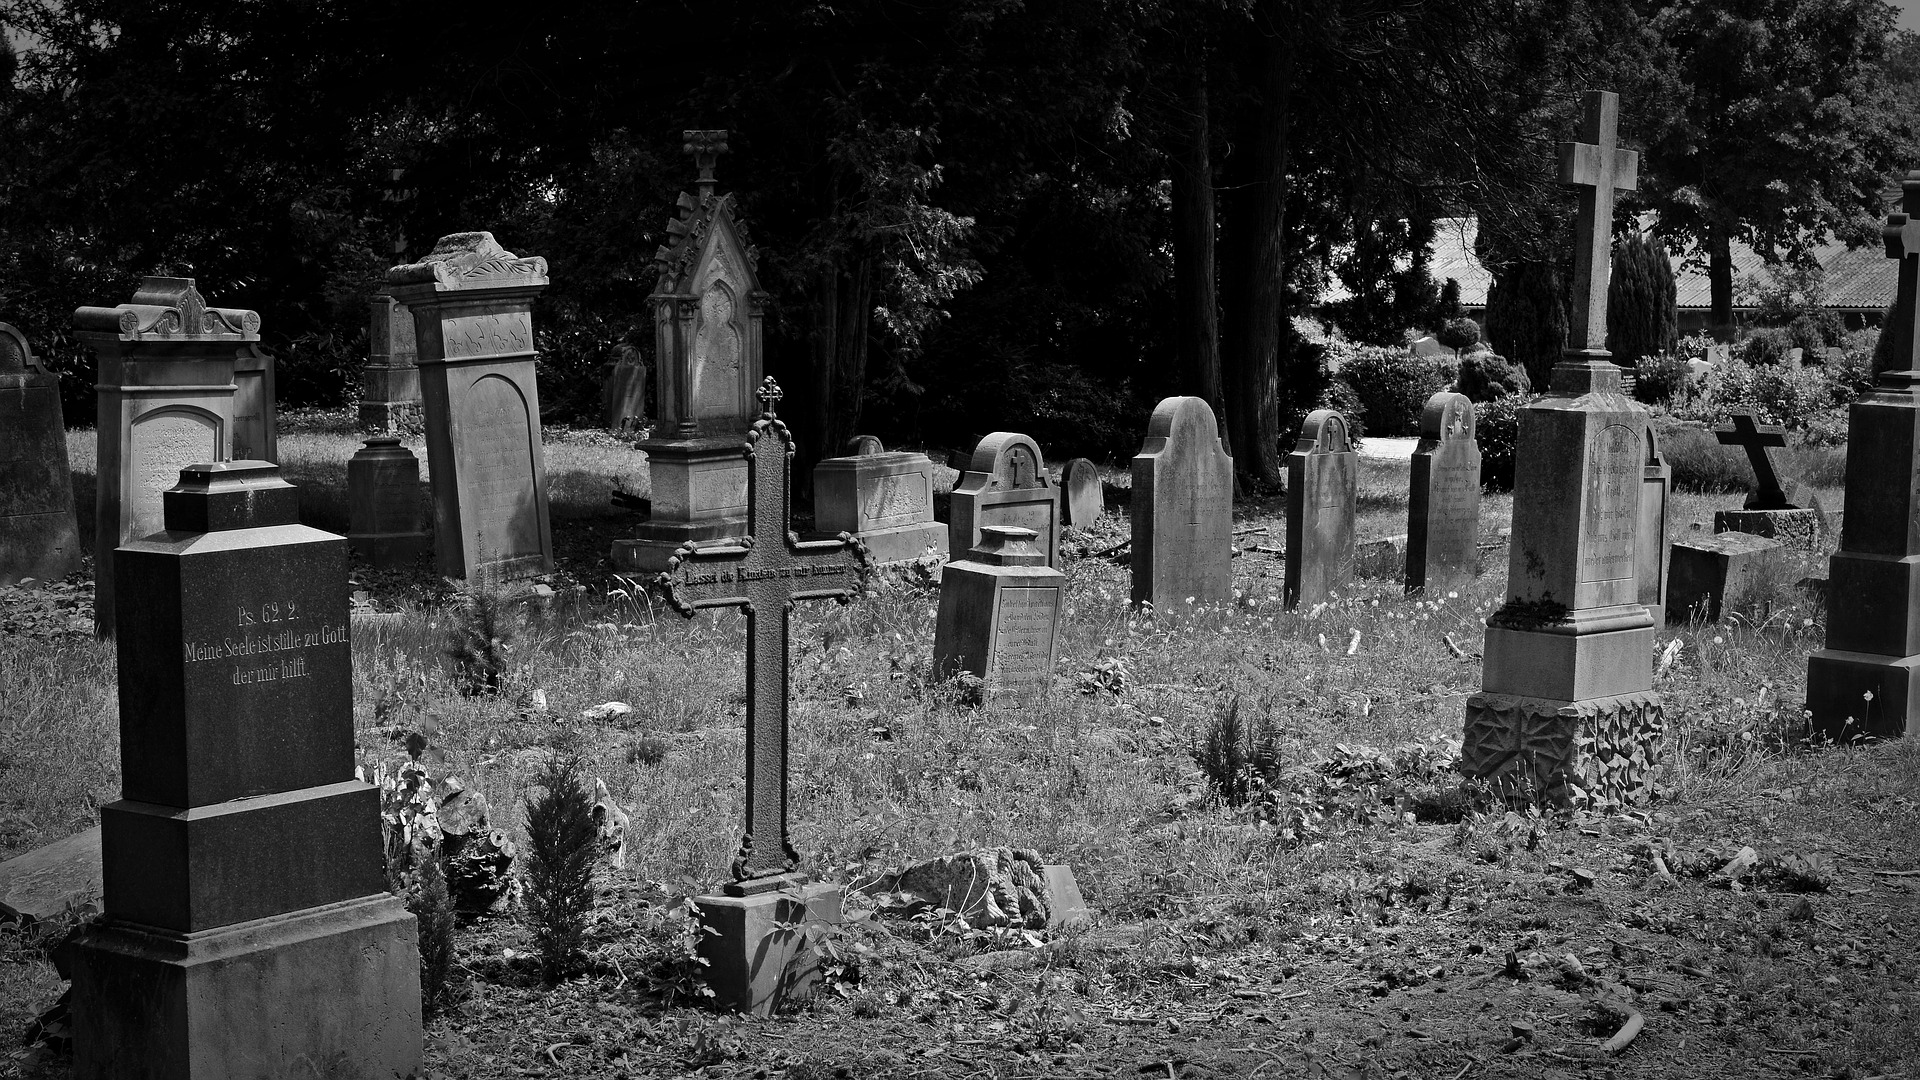 Graves in cemetery